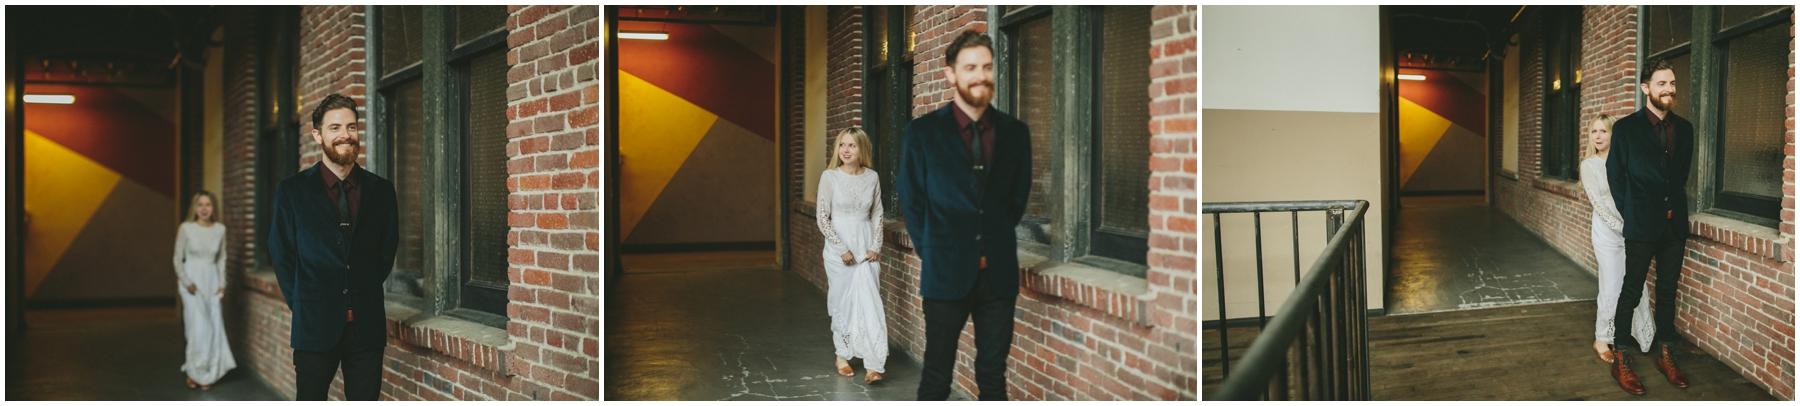 Natalie+Corey-WEDDING_KELLYBOITANO_0018